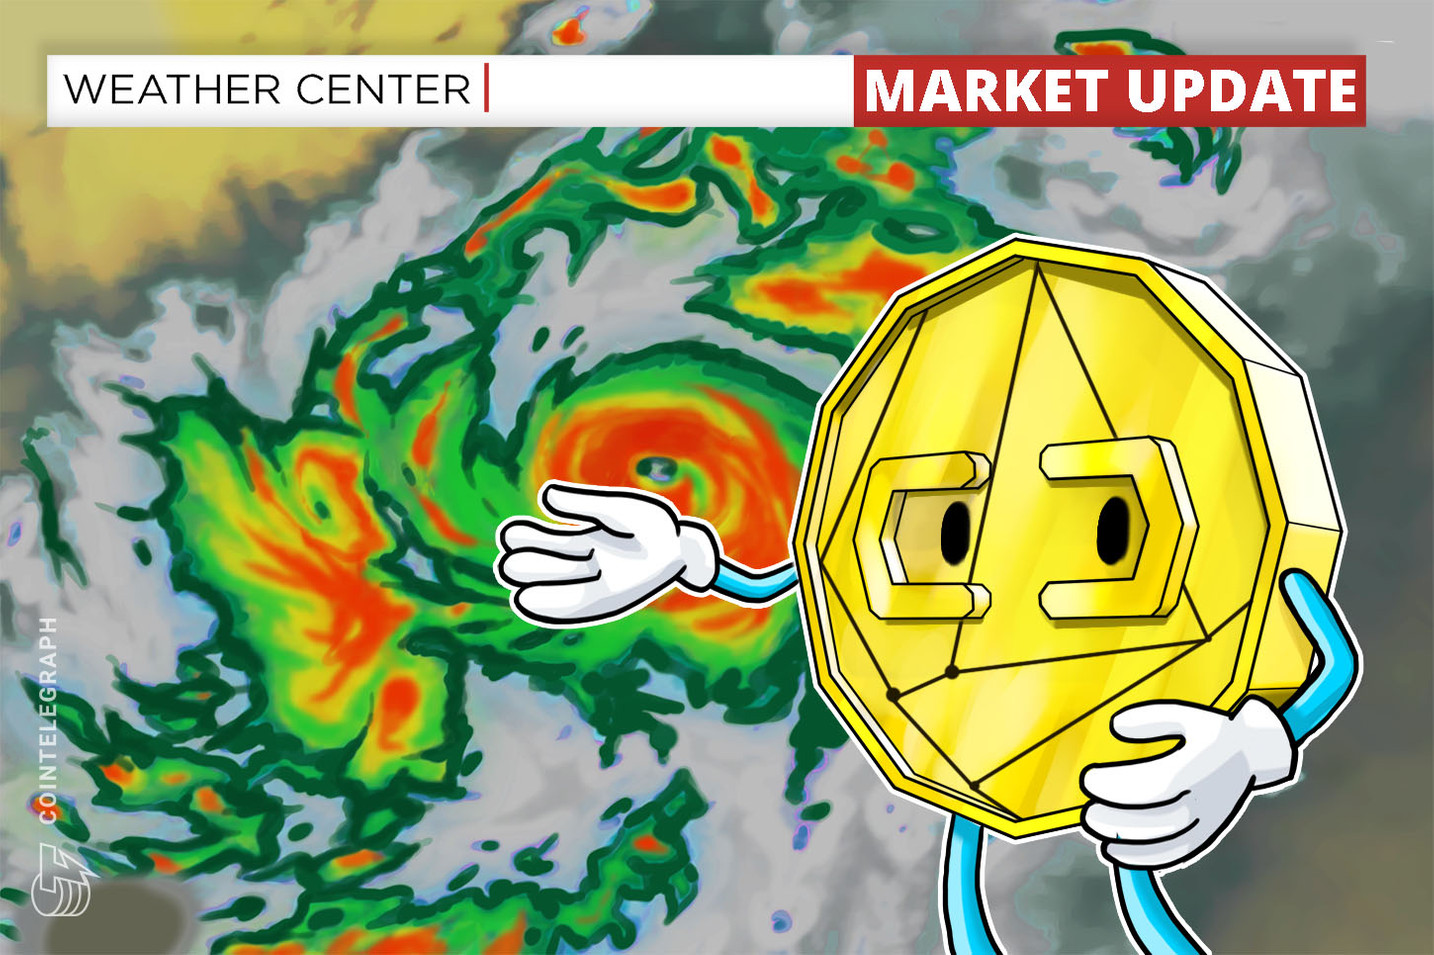 Bitcoin Breaks $9,300 as US Stock Market Sees Minor Uptrend